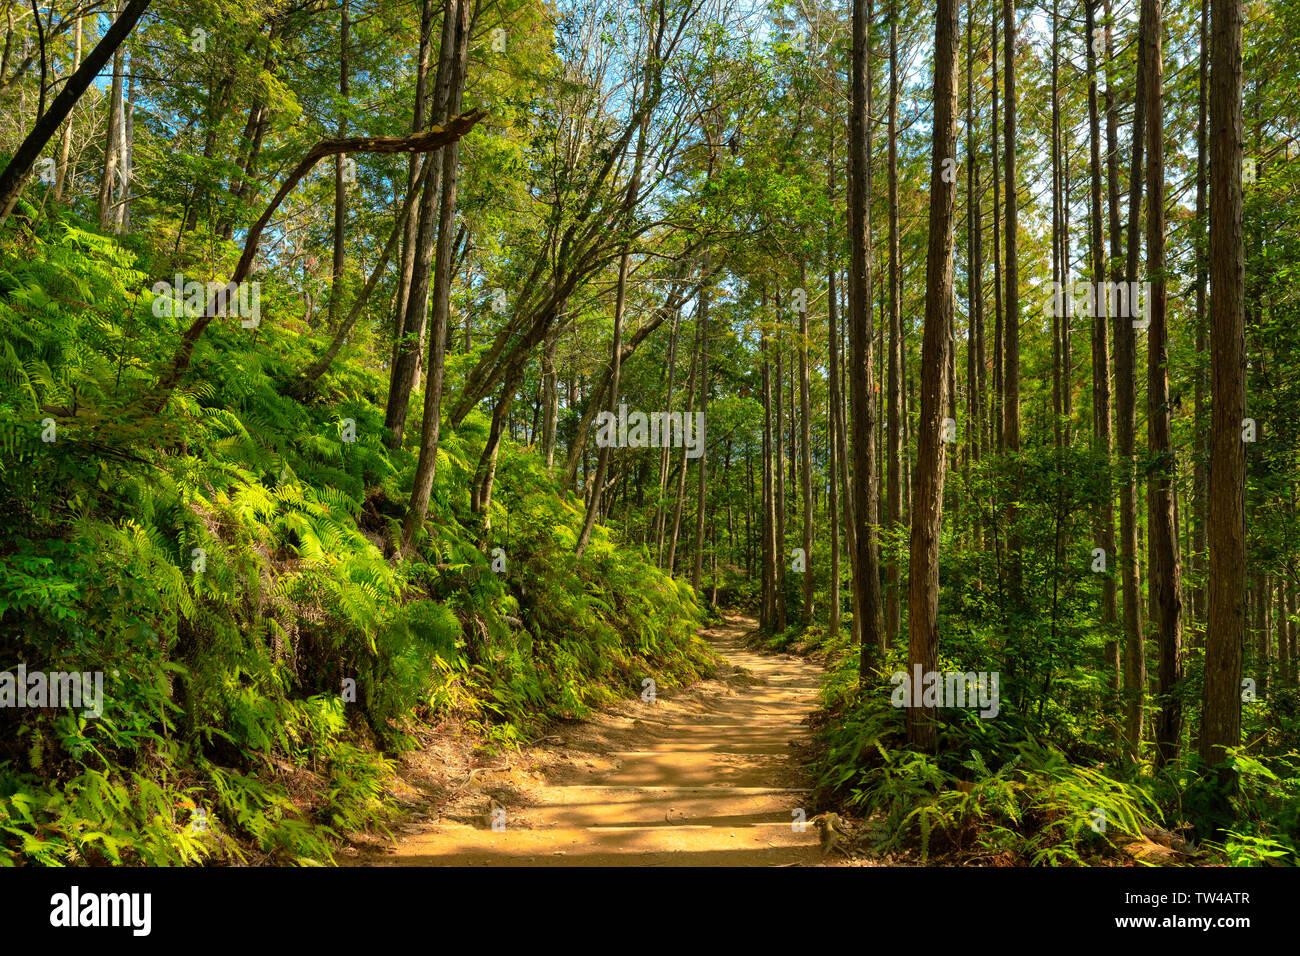 Wild cryptomeria forest of the Kumano Kodo pilgrimage trail, Japan Stock Photo